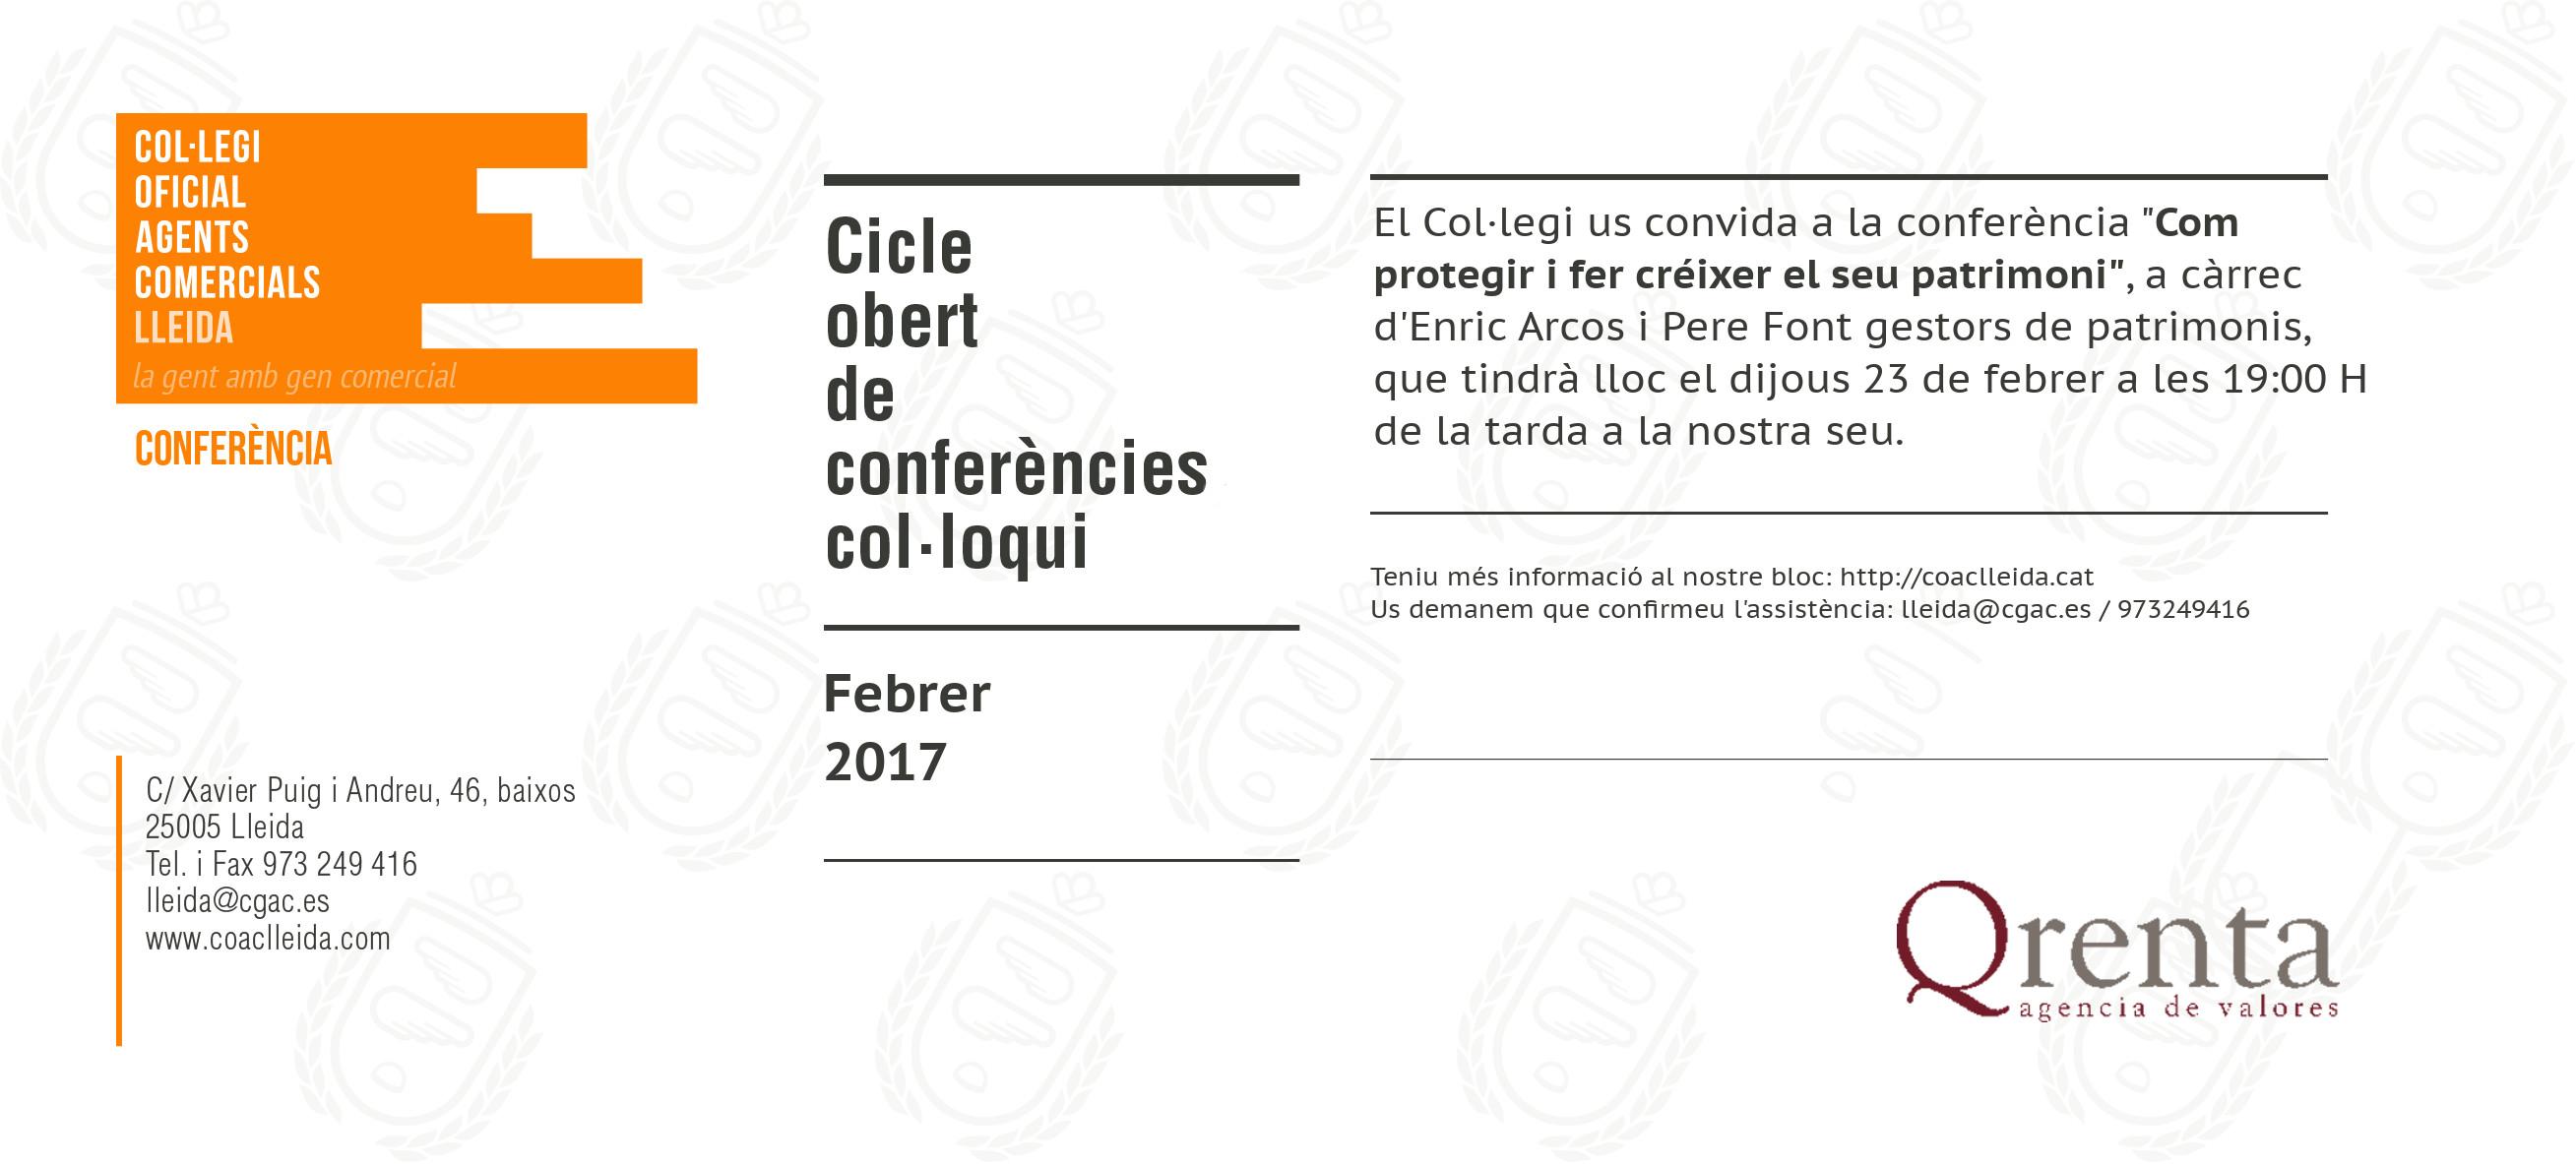 conferencia-febrer(2)2017